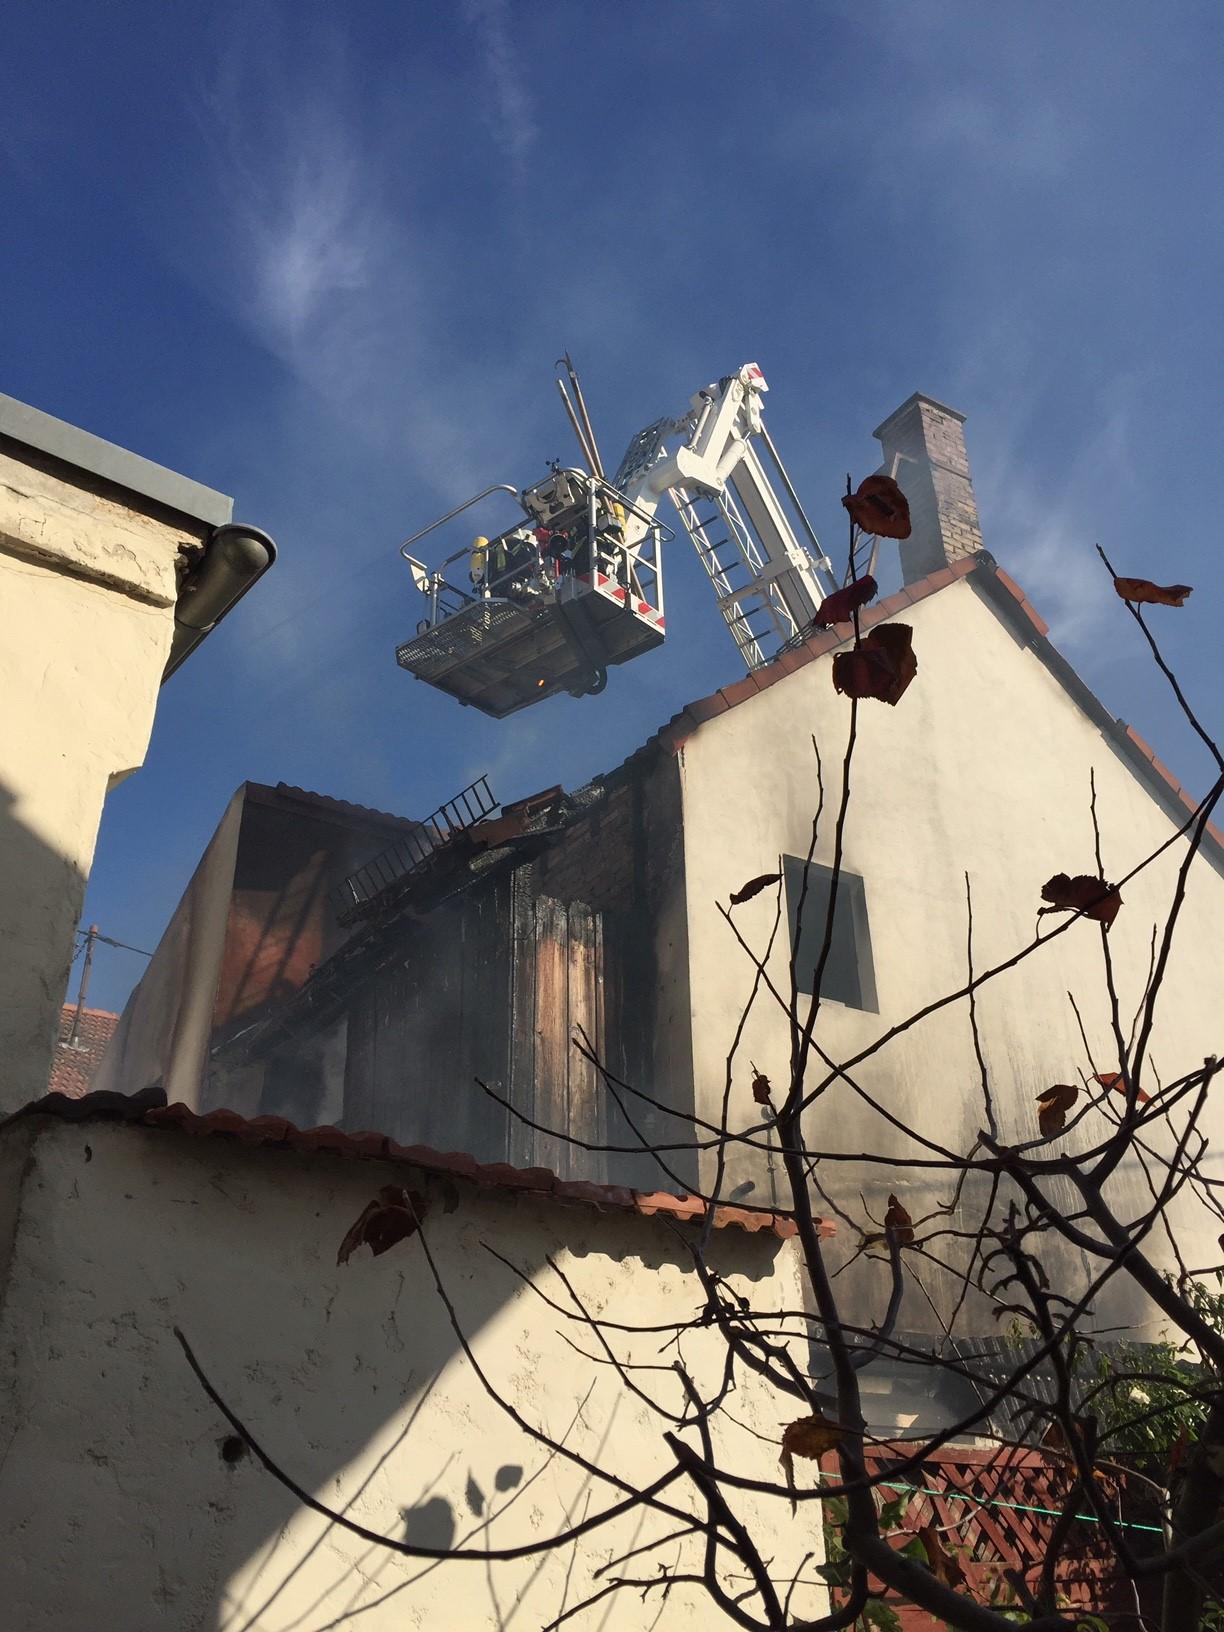 Pol Pdwo Fahrrad Akku Löst Wohnungsbrand Aus Presseportal